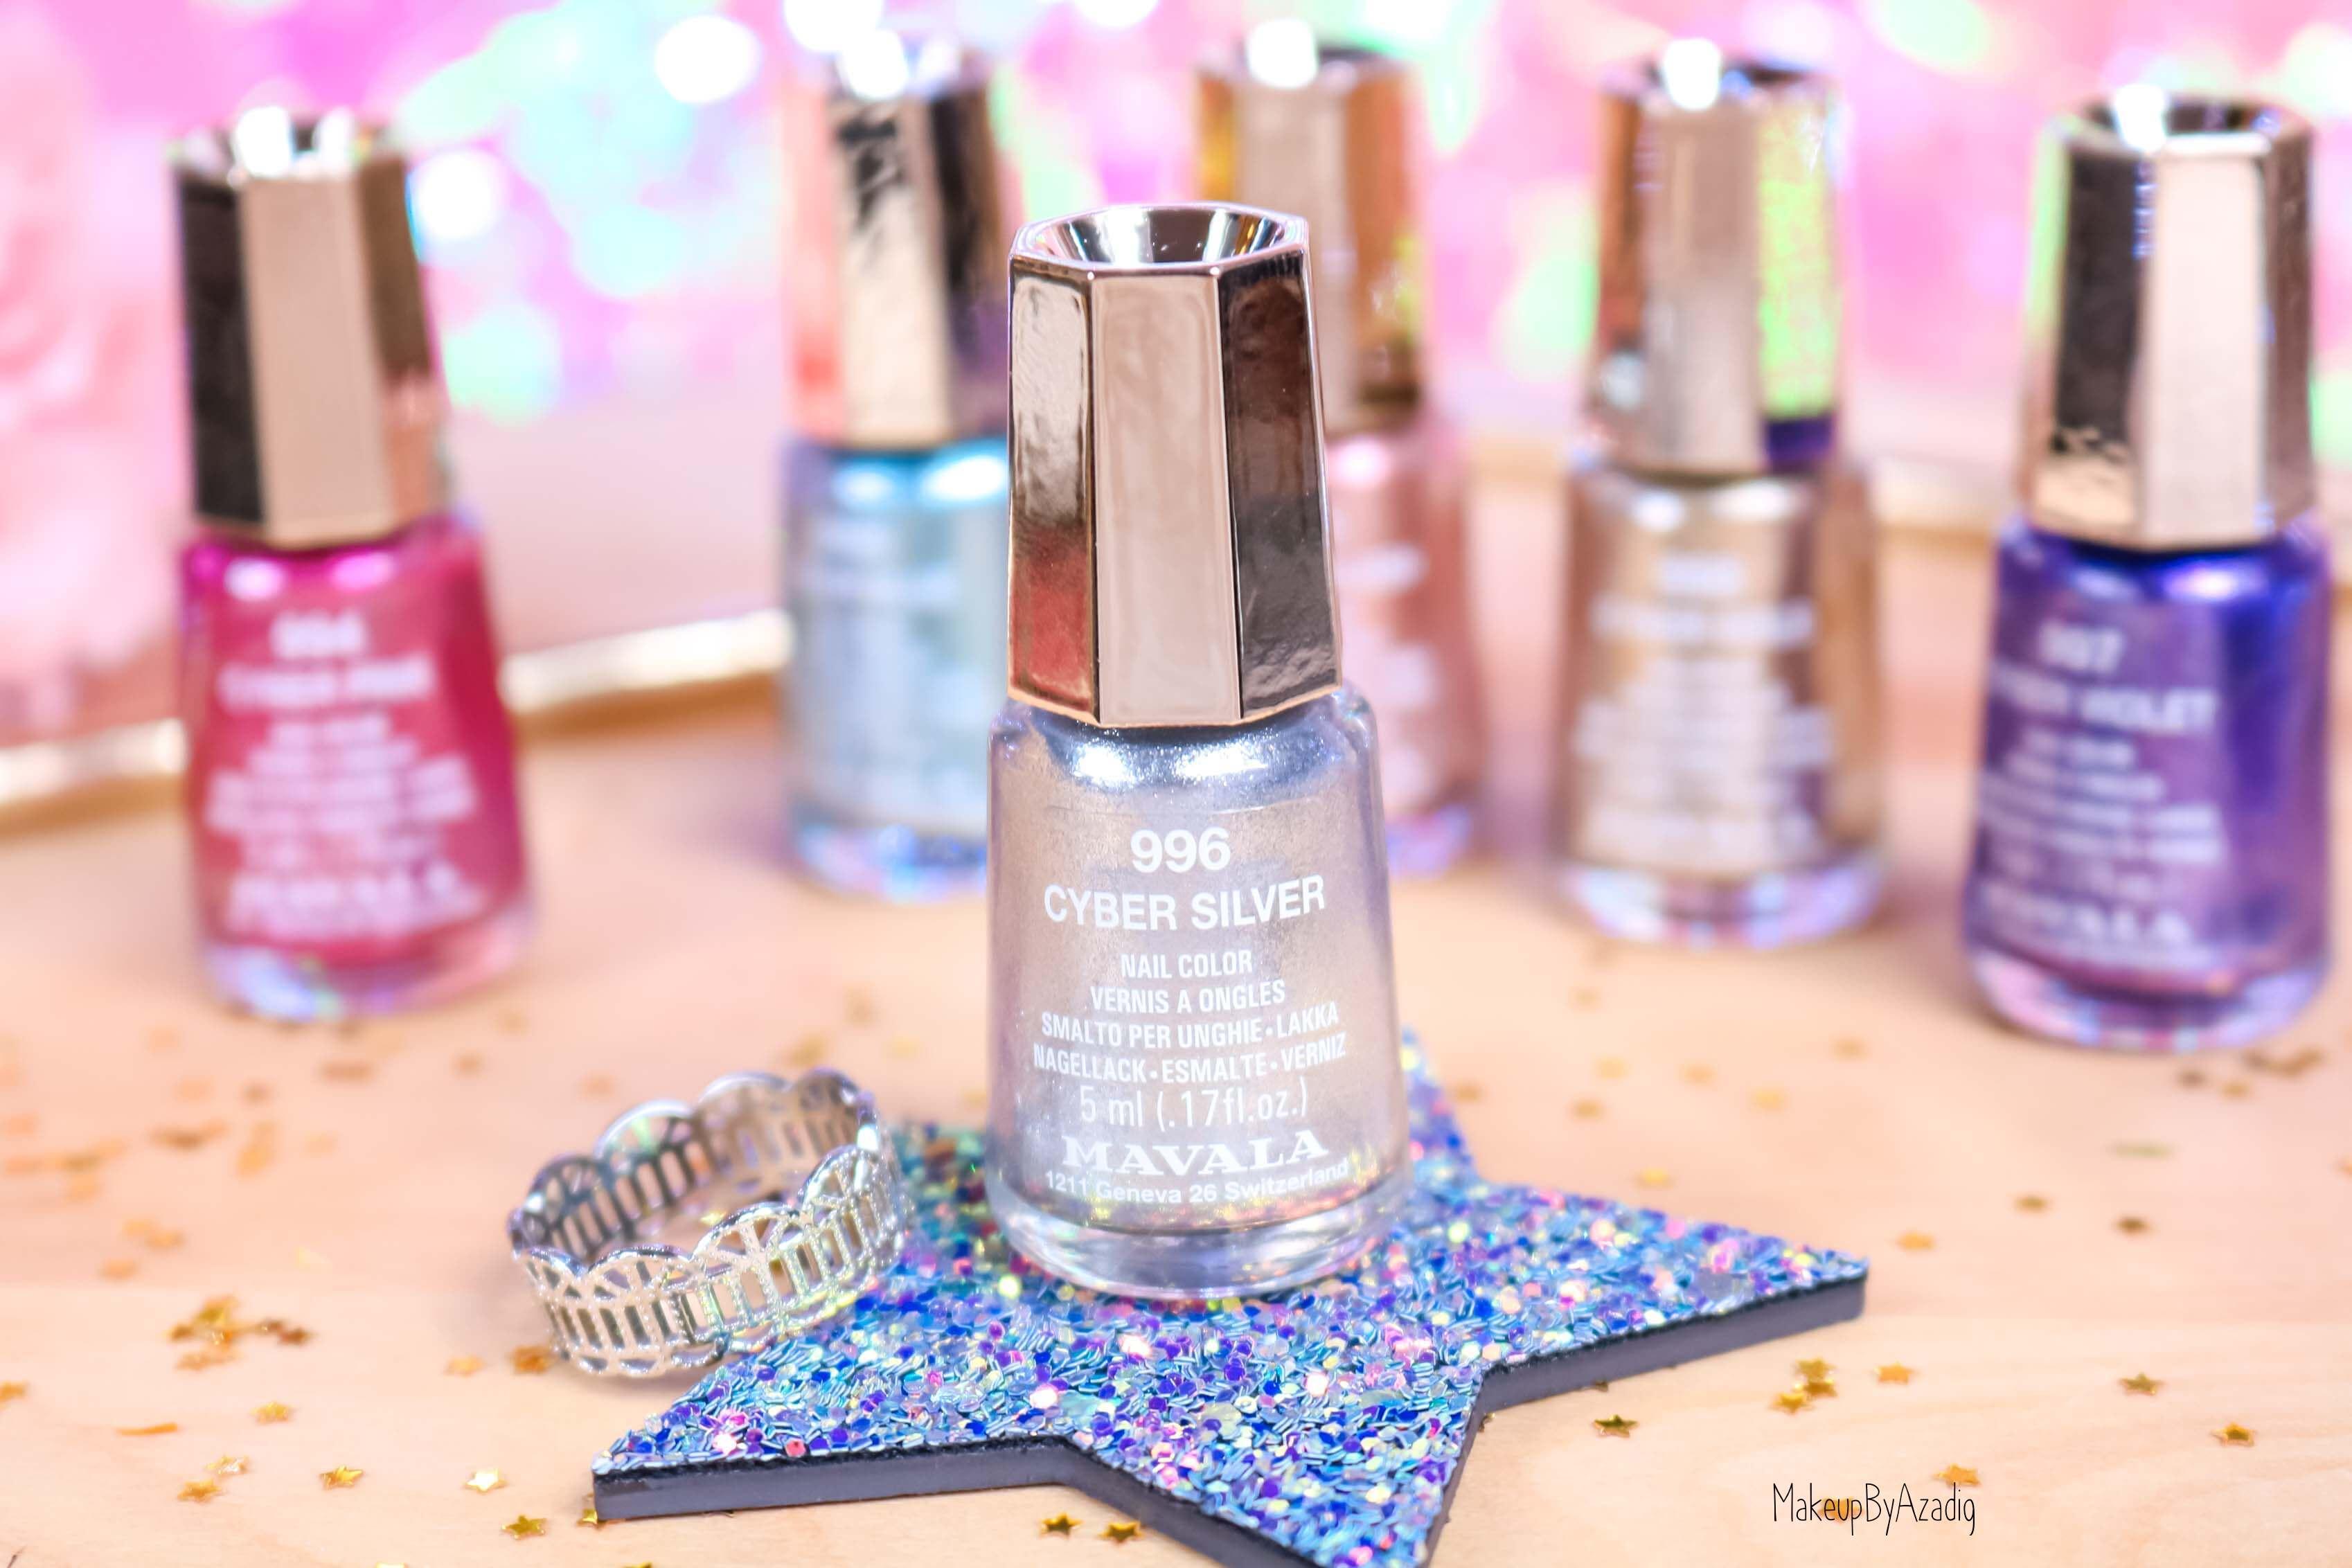 revue-collection-vernis-nails-cyber-chic-fetes-noel-metallique-gold-silver-makeupbyazadig-swatch-avis-prix-argent